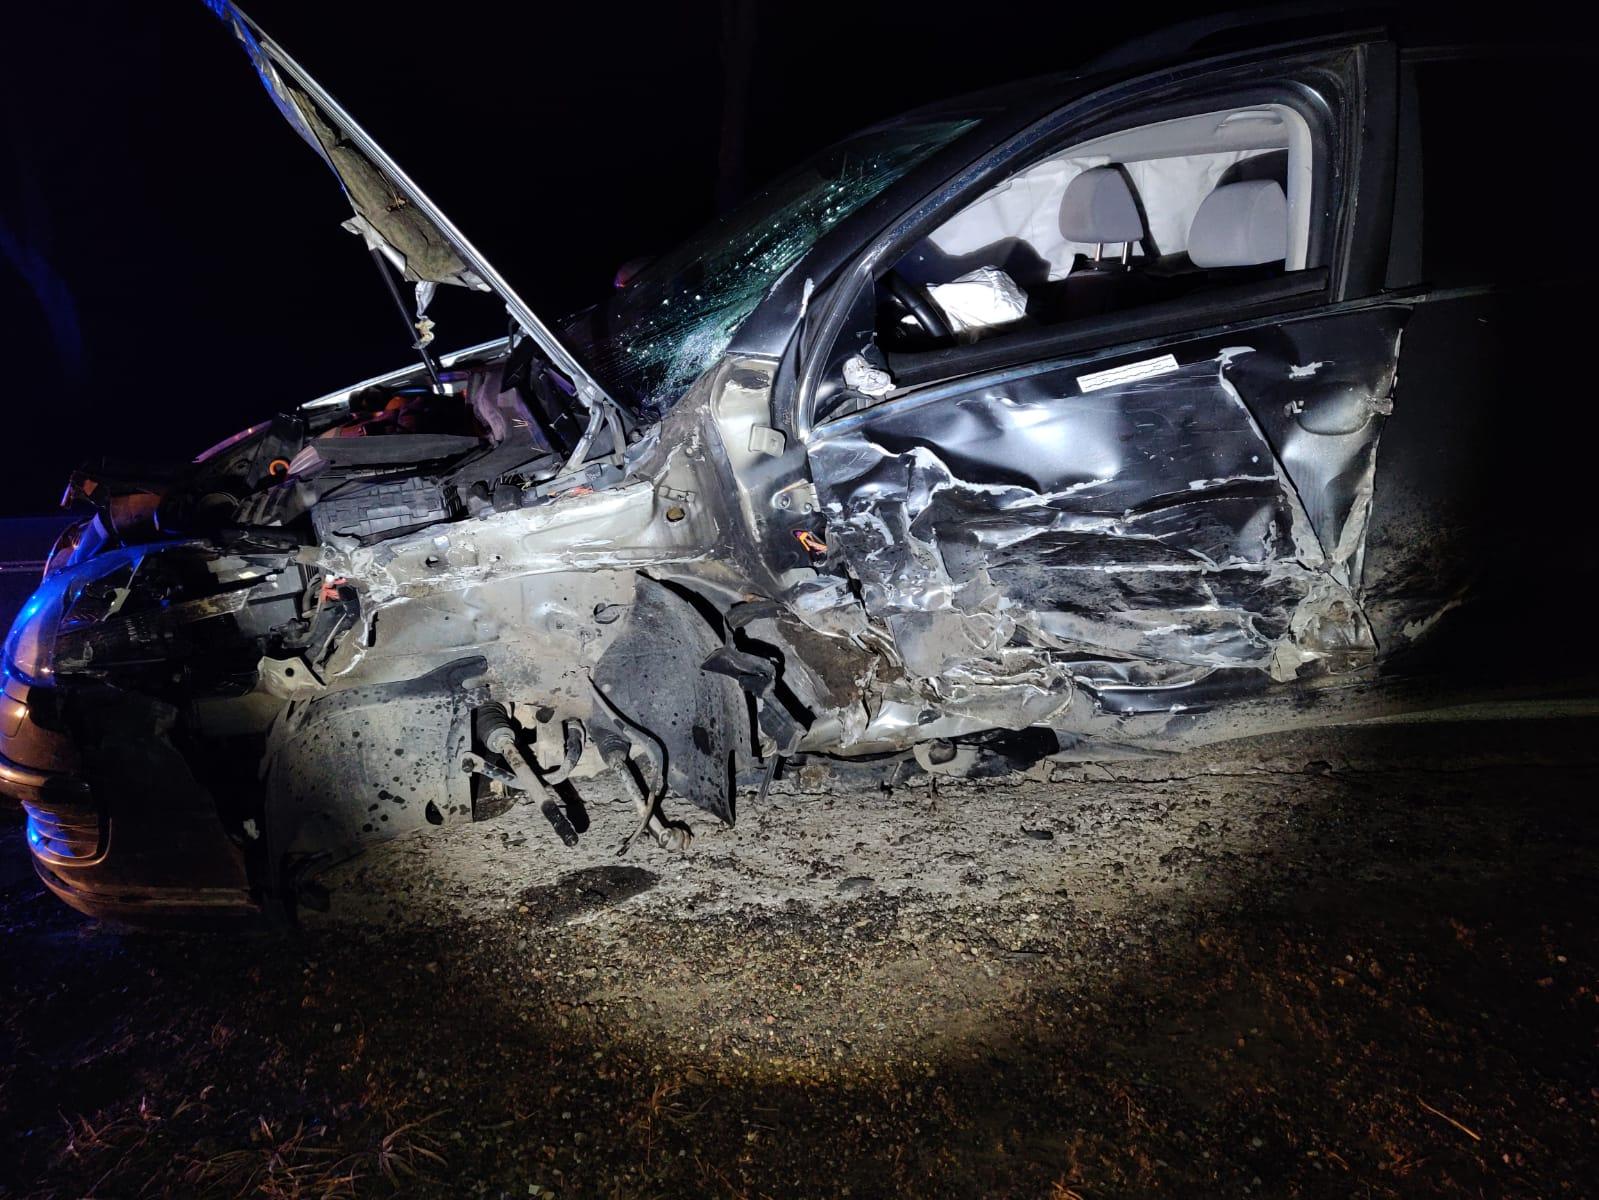 http://m.wm.pl/2019/02/orig/0000010643-3-miejsce-wypadku-531814.jpg